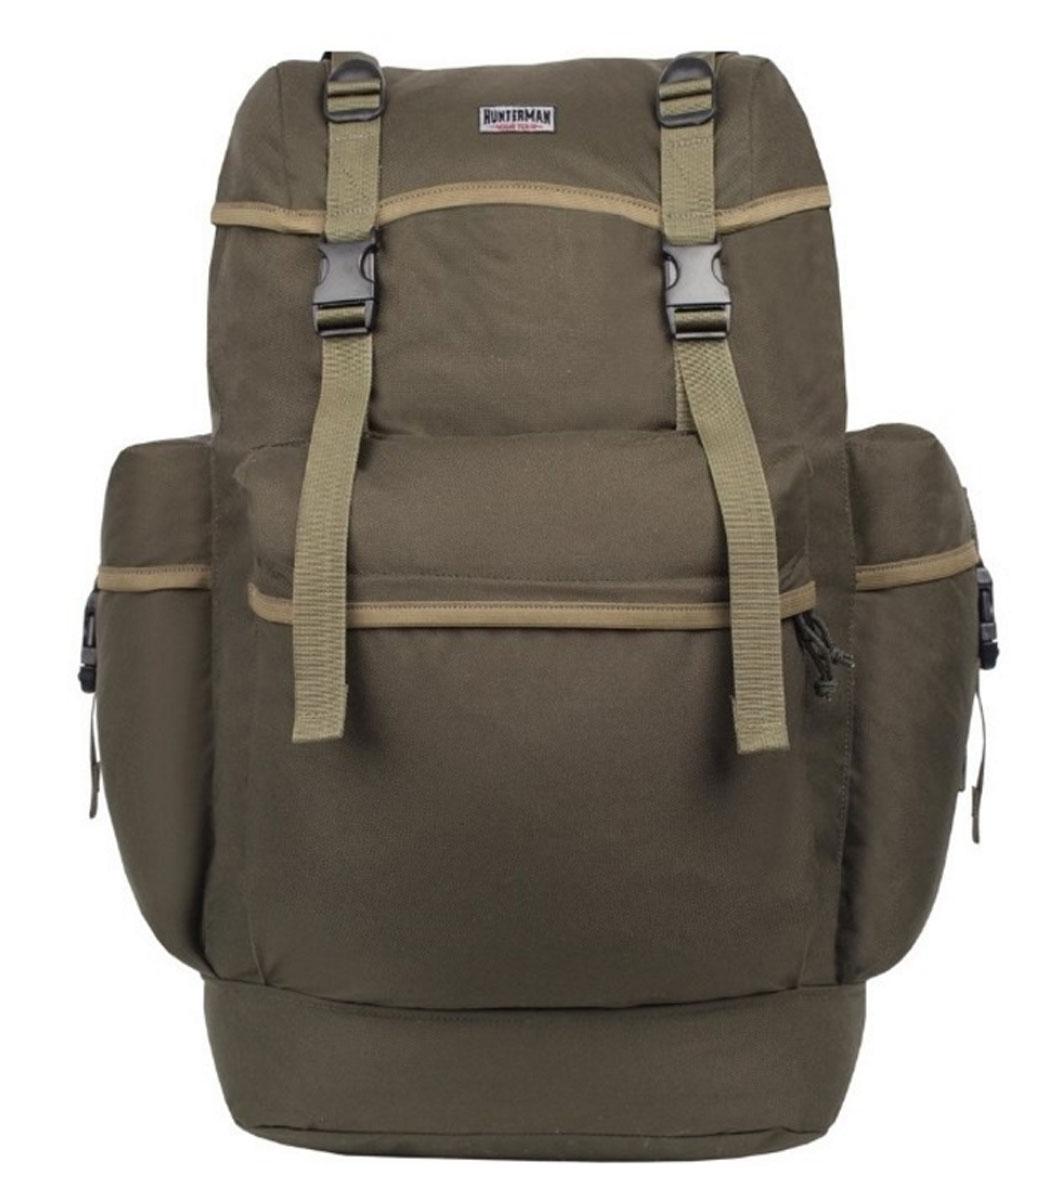 Рюкзак для охоты Hunter Nova Tour  Охотник 70 V3 , цвет: зеленый, 70 л - Охота